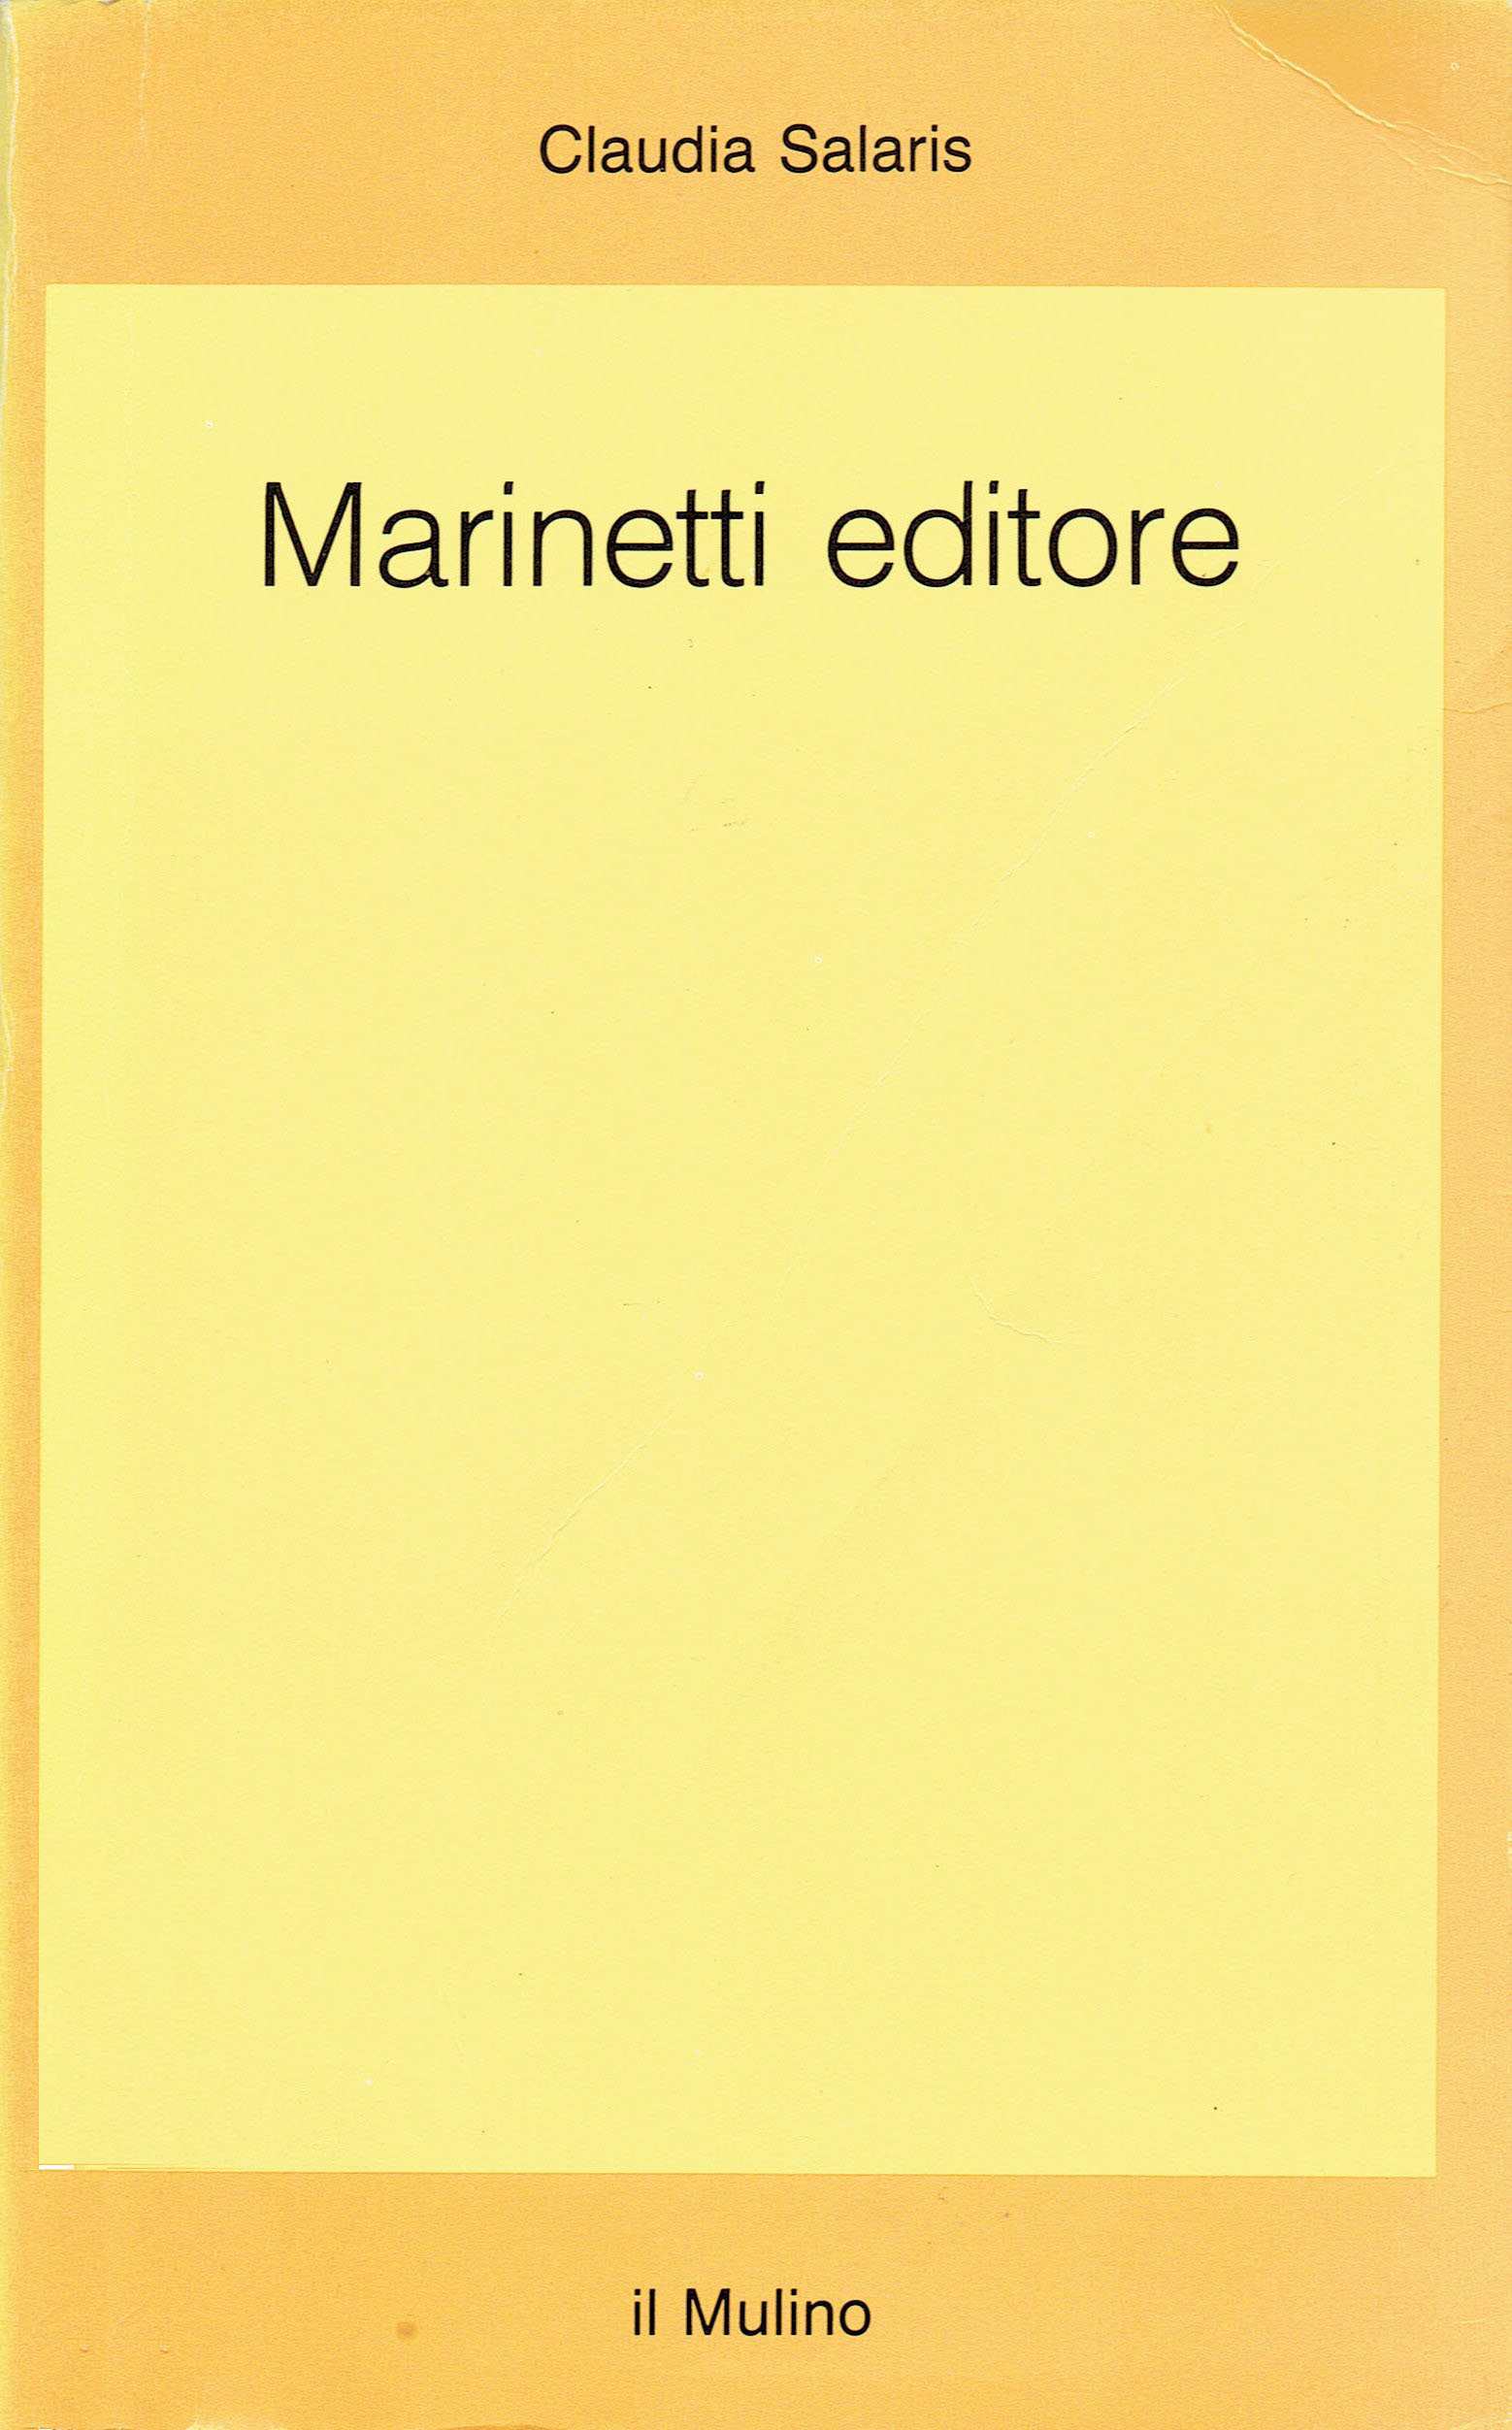 Marinetti editore